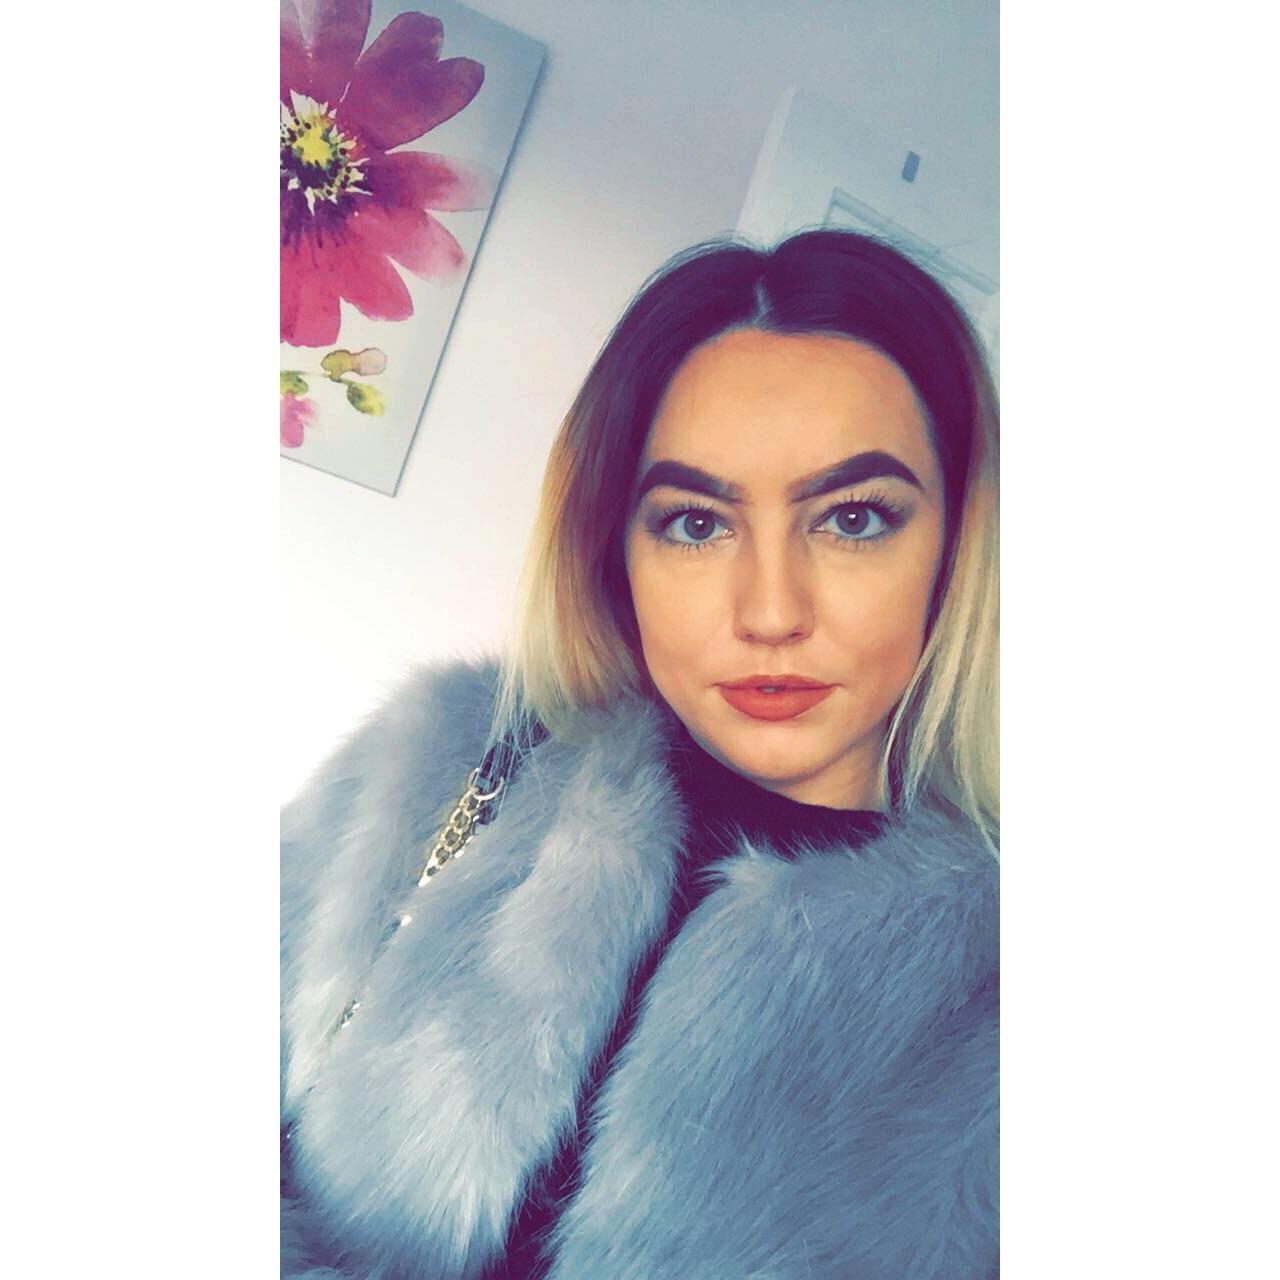 Chloe Howlett